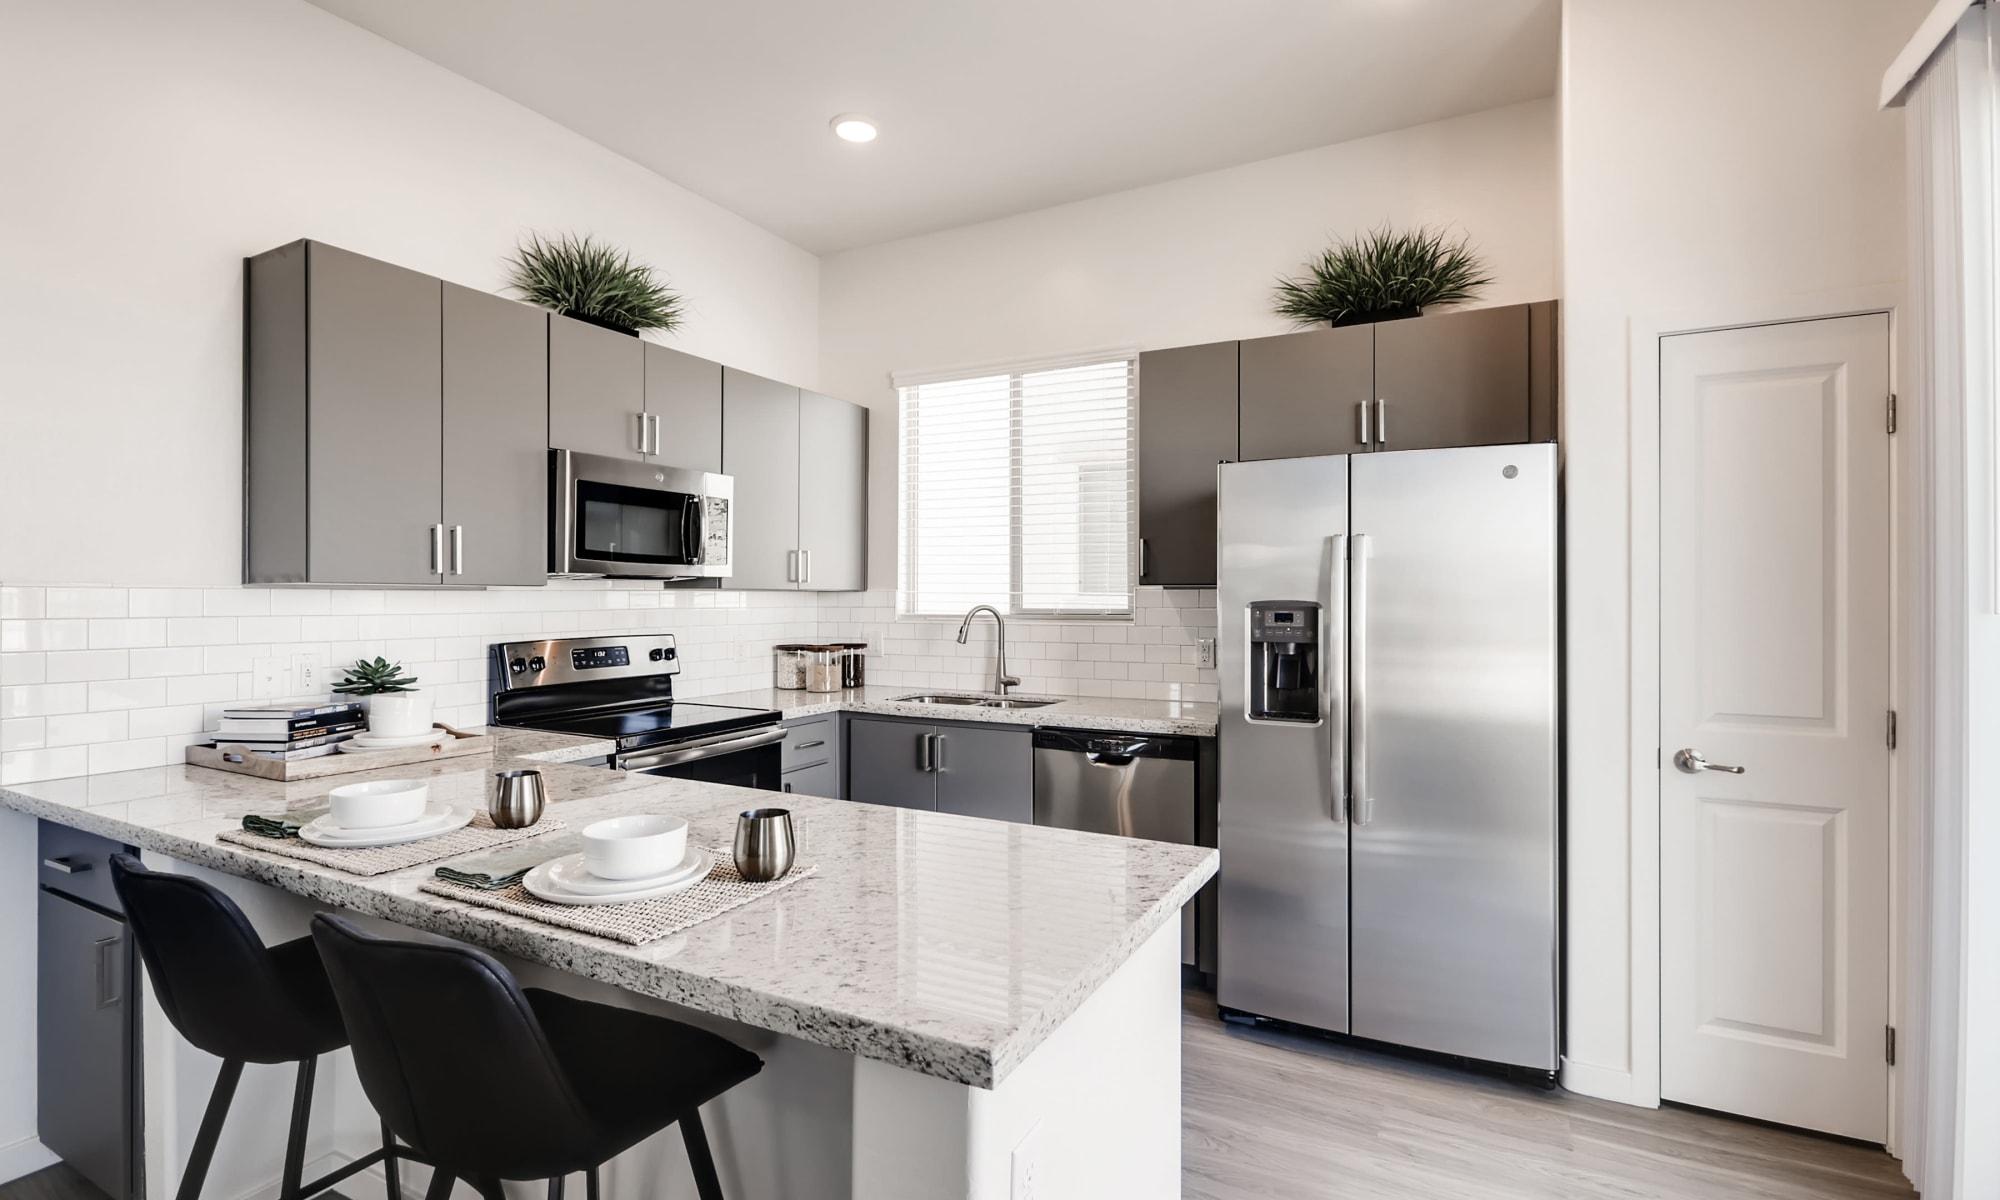 Avilla Enclave apartment homes in Mesa, Arizona